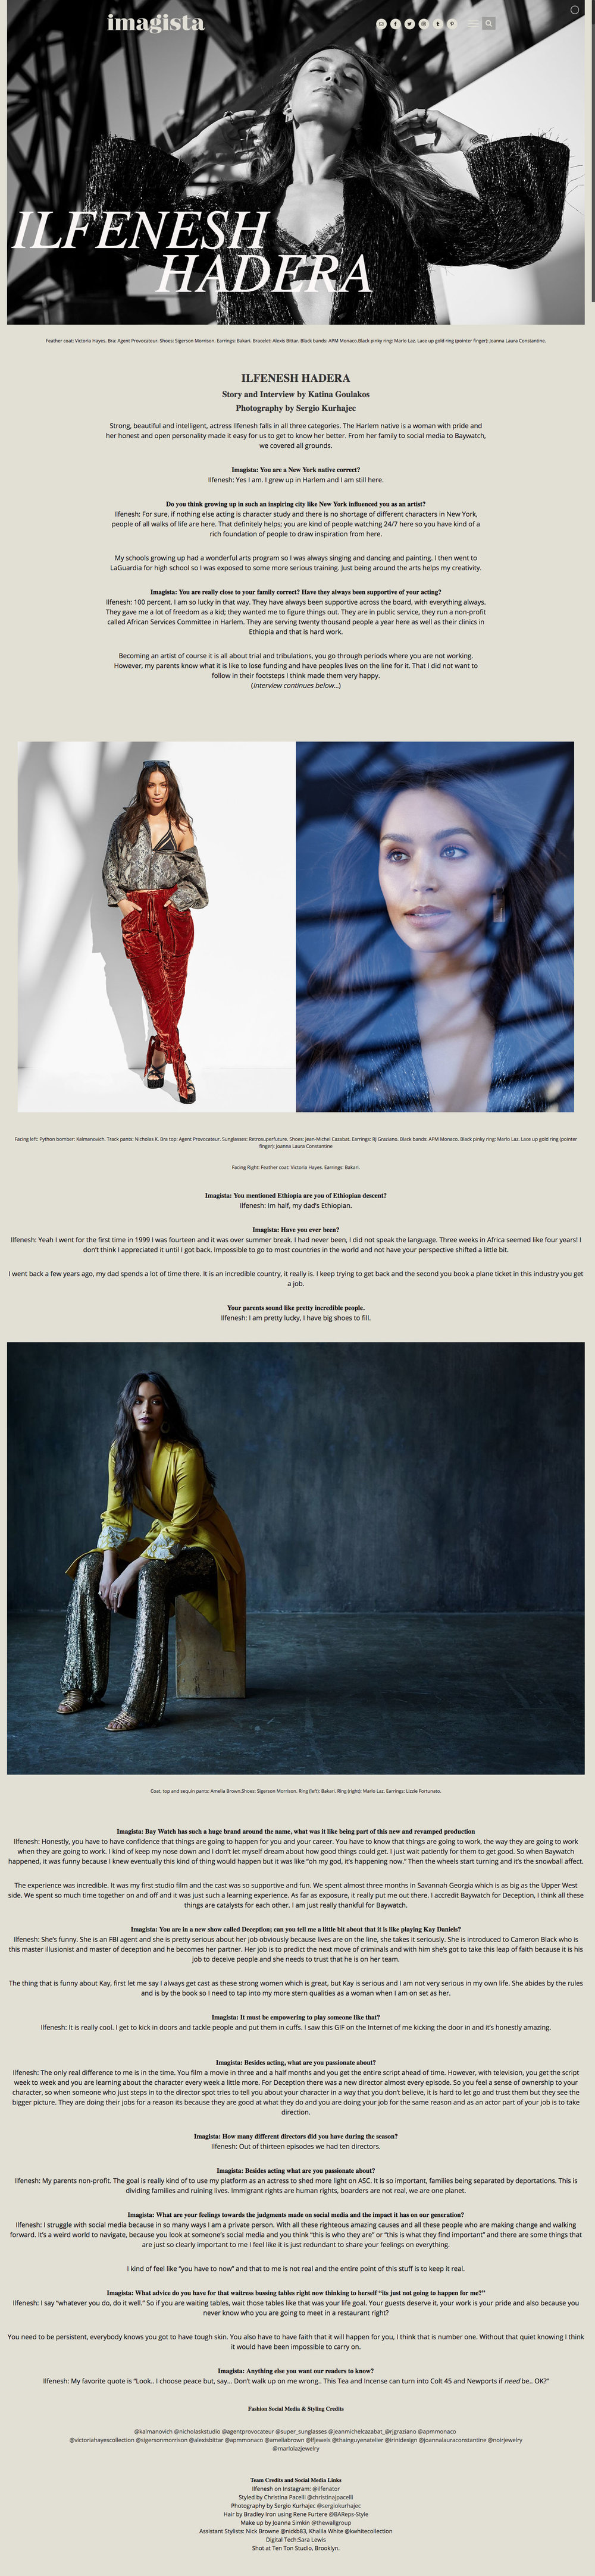 5.17.18 TheImagista.com BAKARI (1).jpg